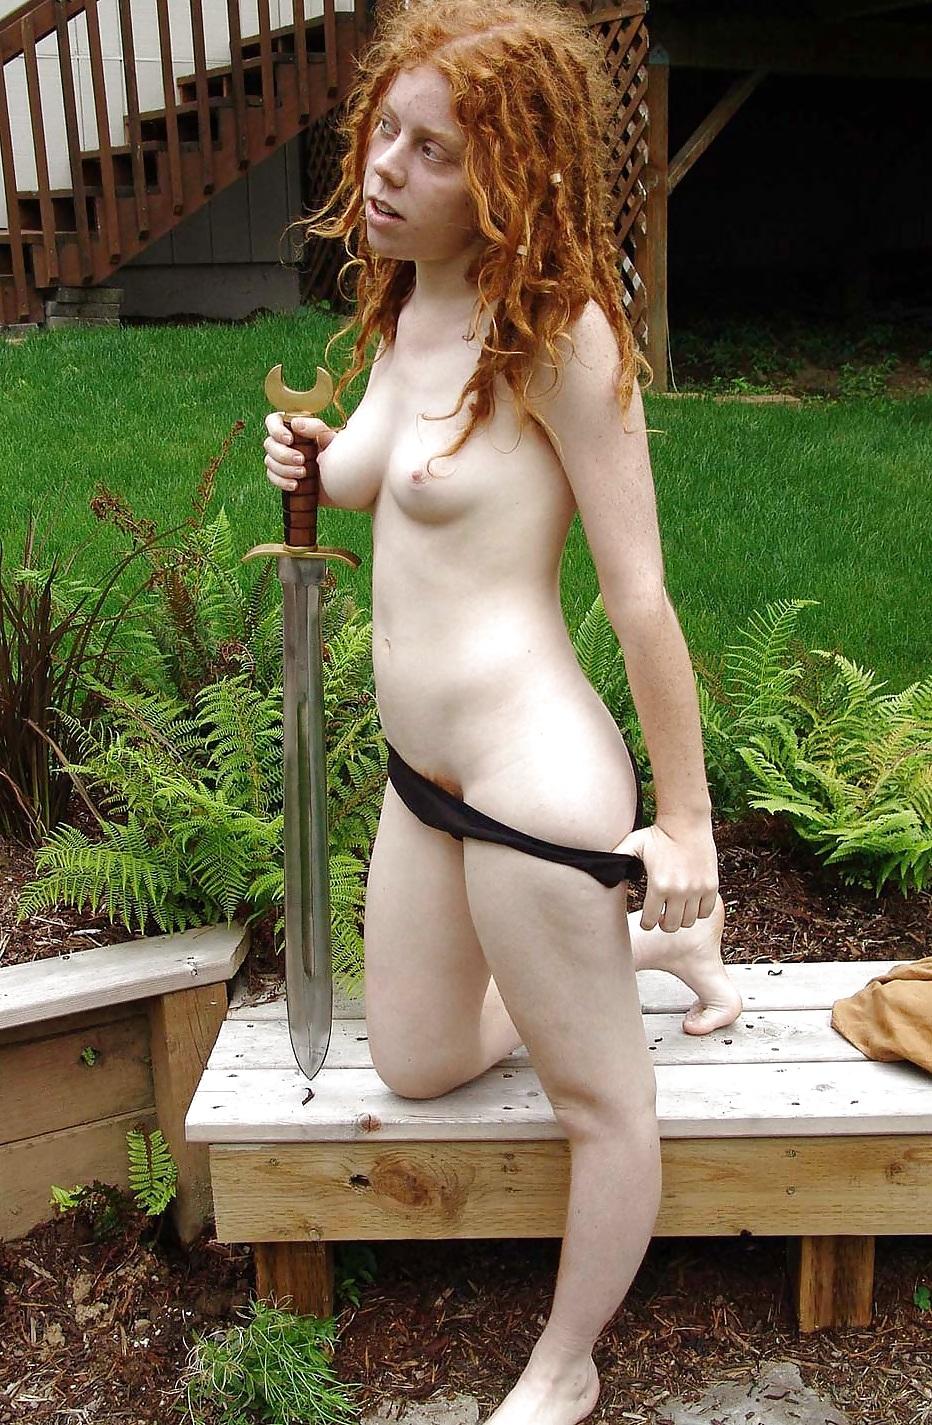 Ida 2 - Redheaded Hippie With Sword - 22 Pics  Xhamster-3996